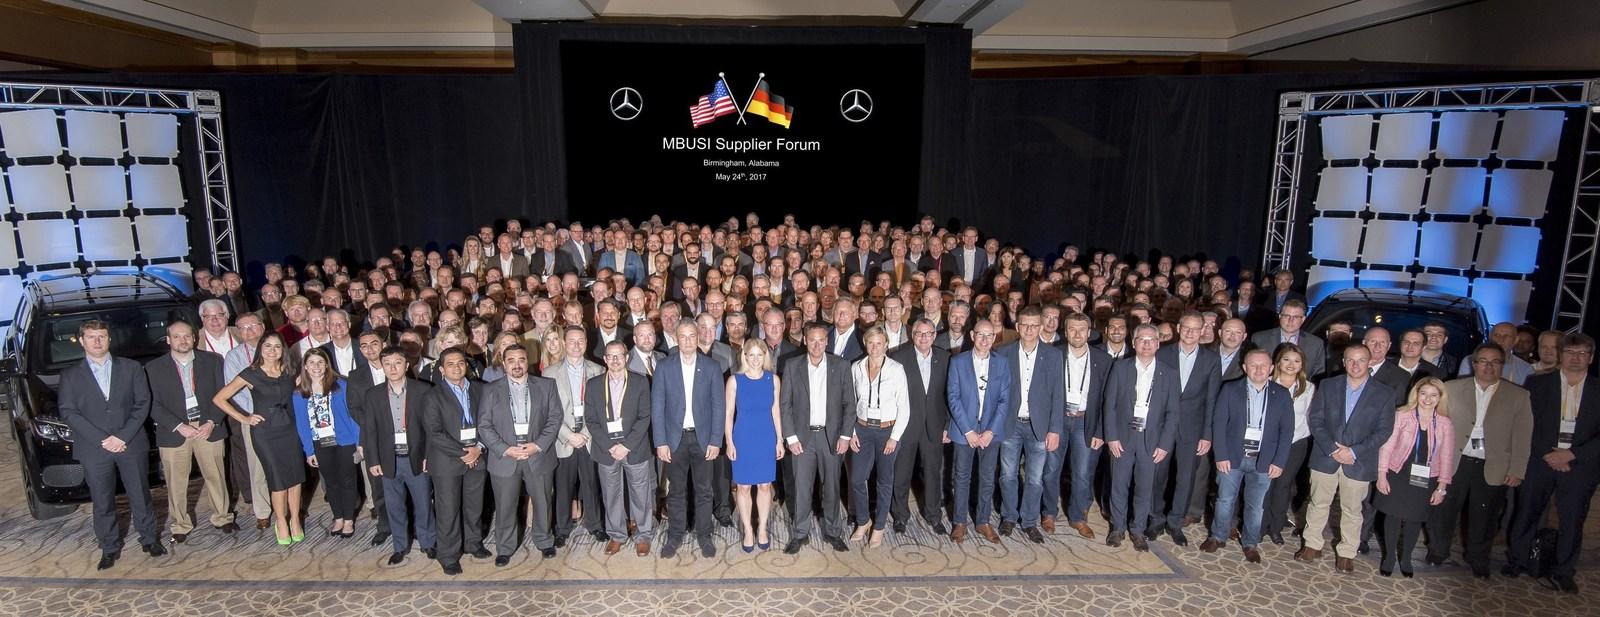 Mercedes benz u s international inc supplier forum 2017 for Mercedes benz us international